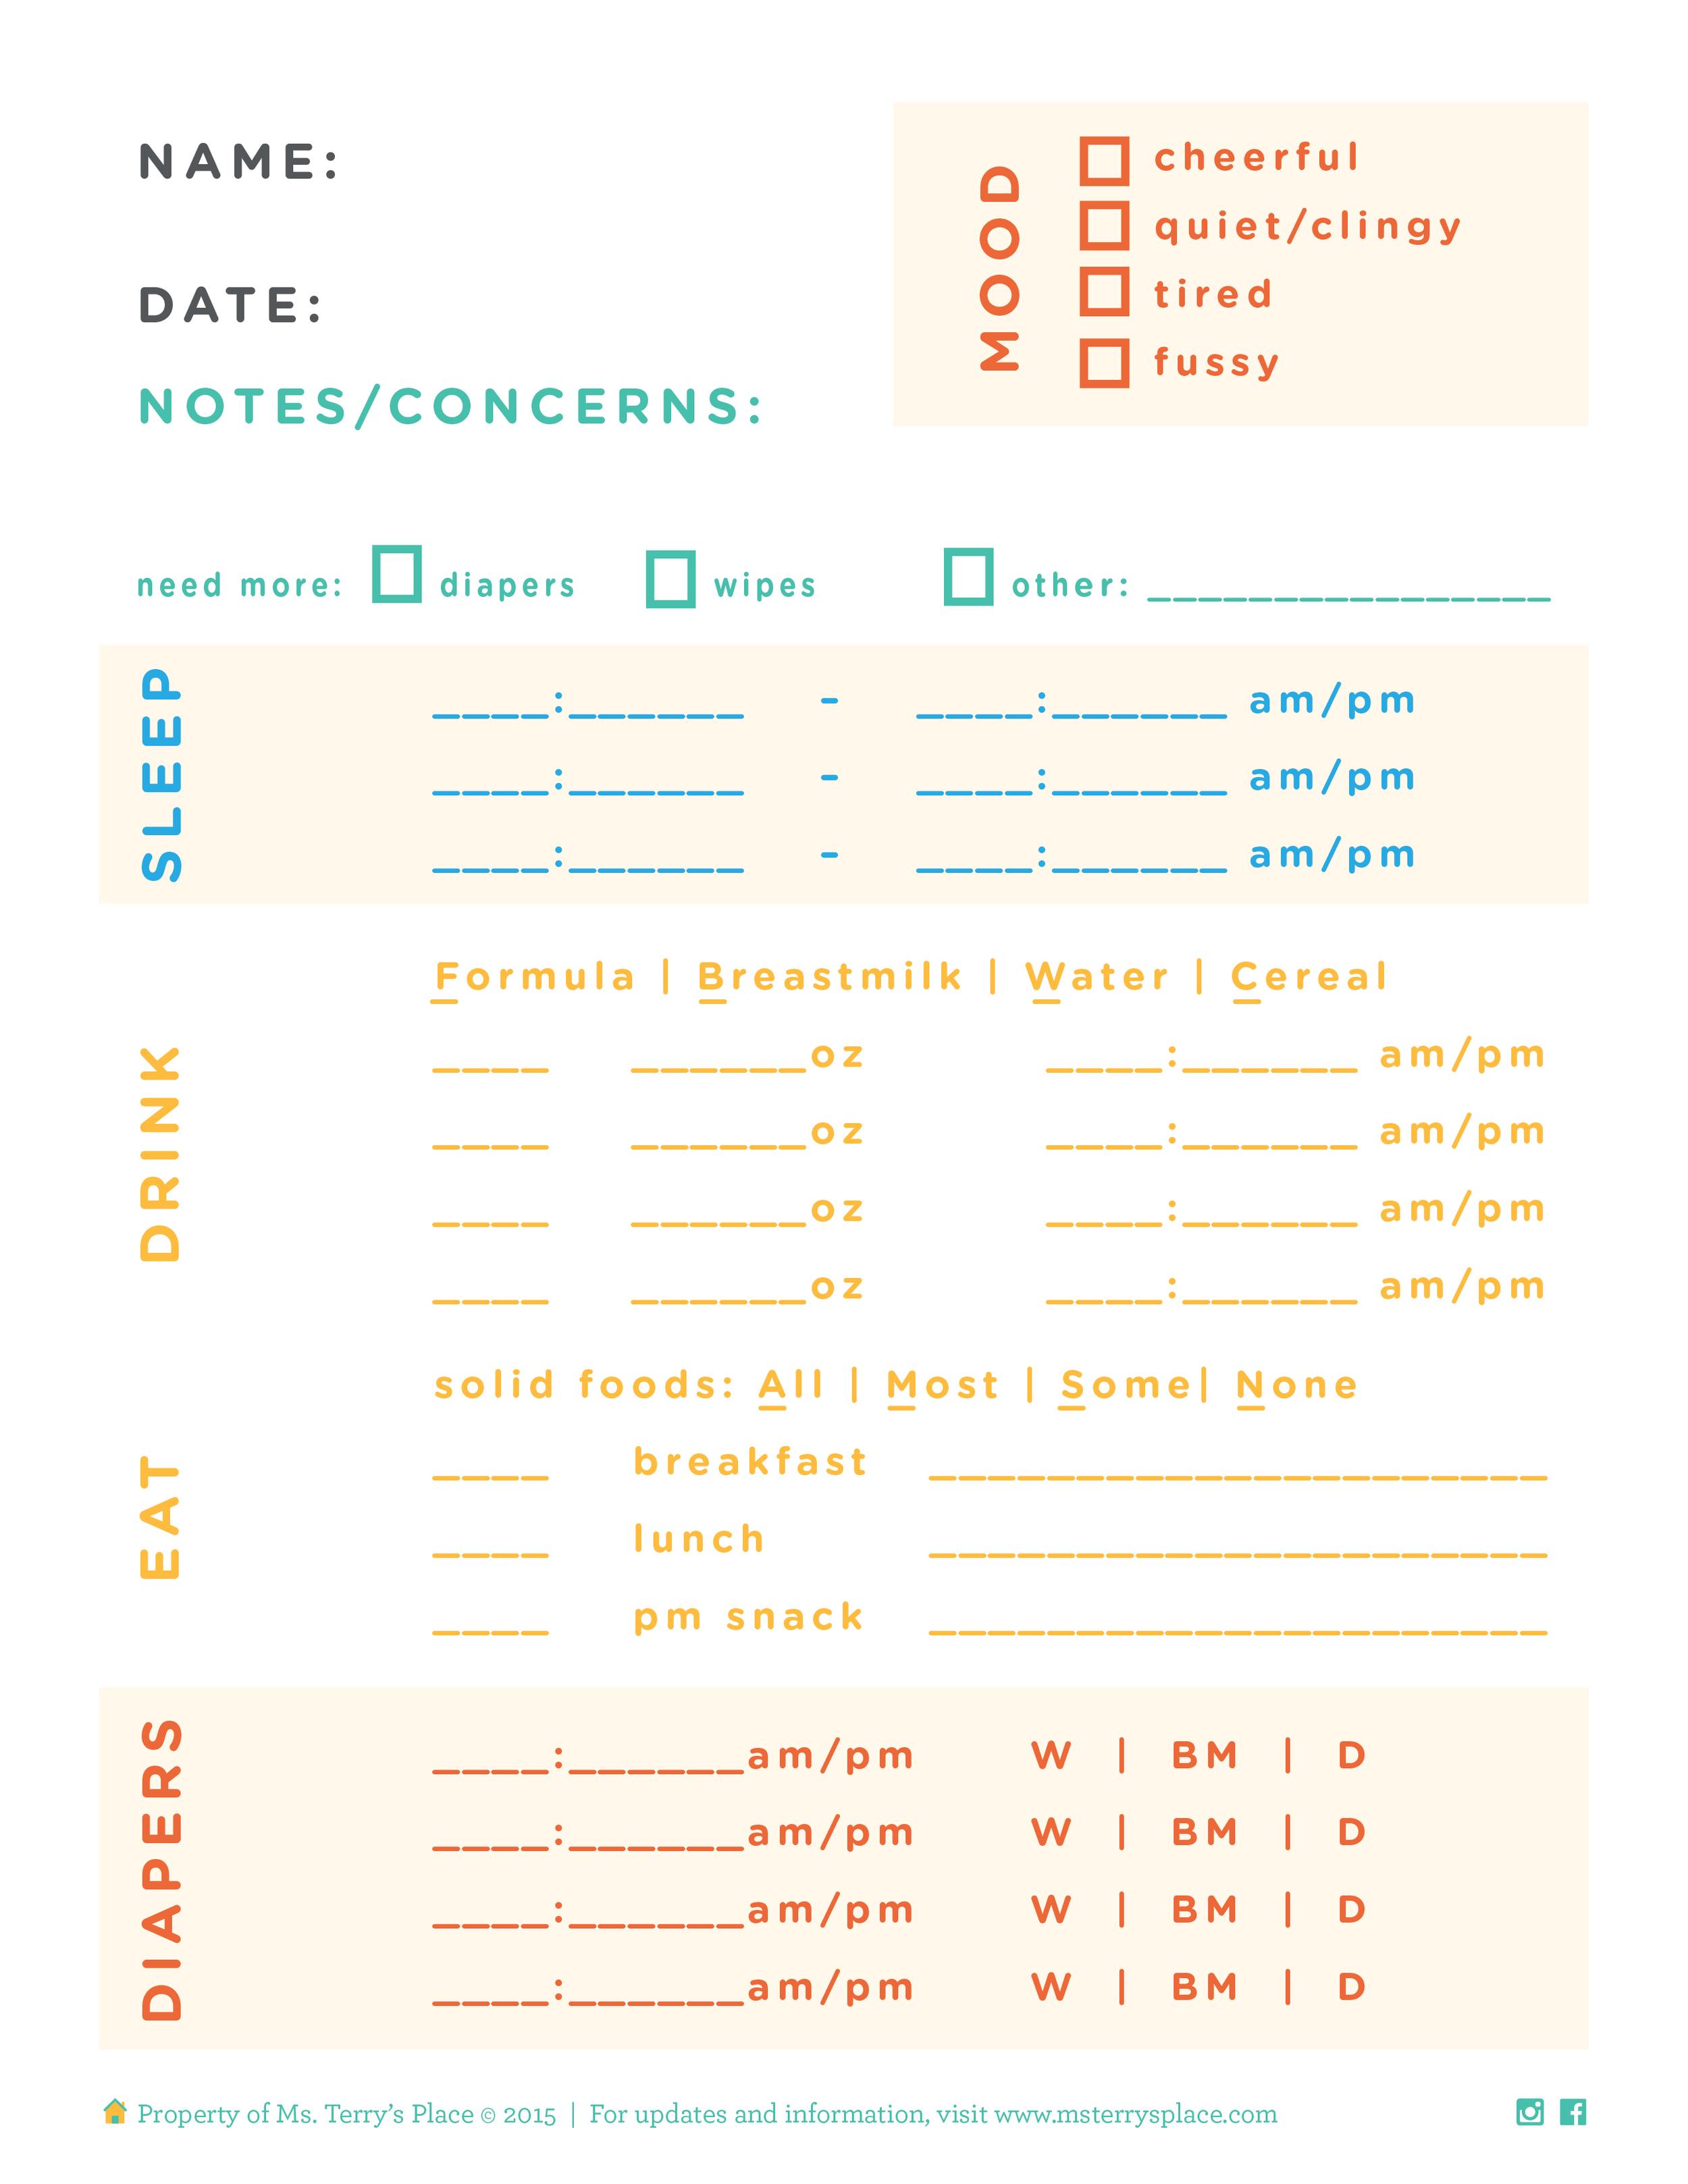 daycare form2.jpg